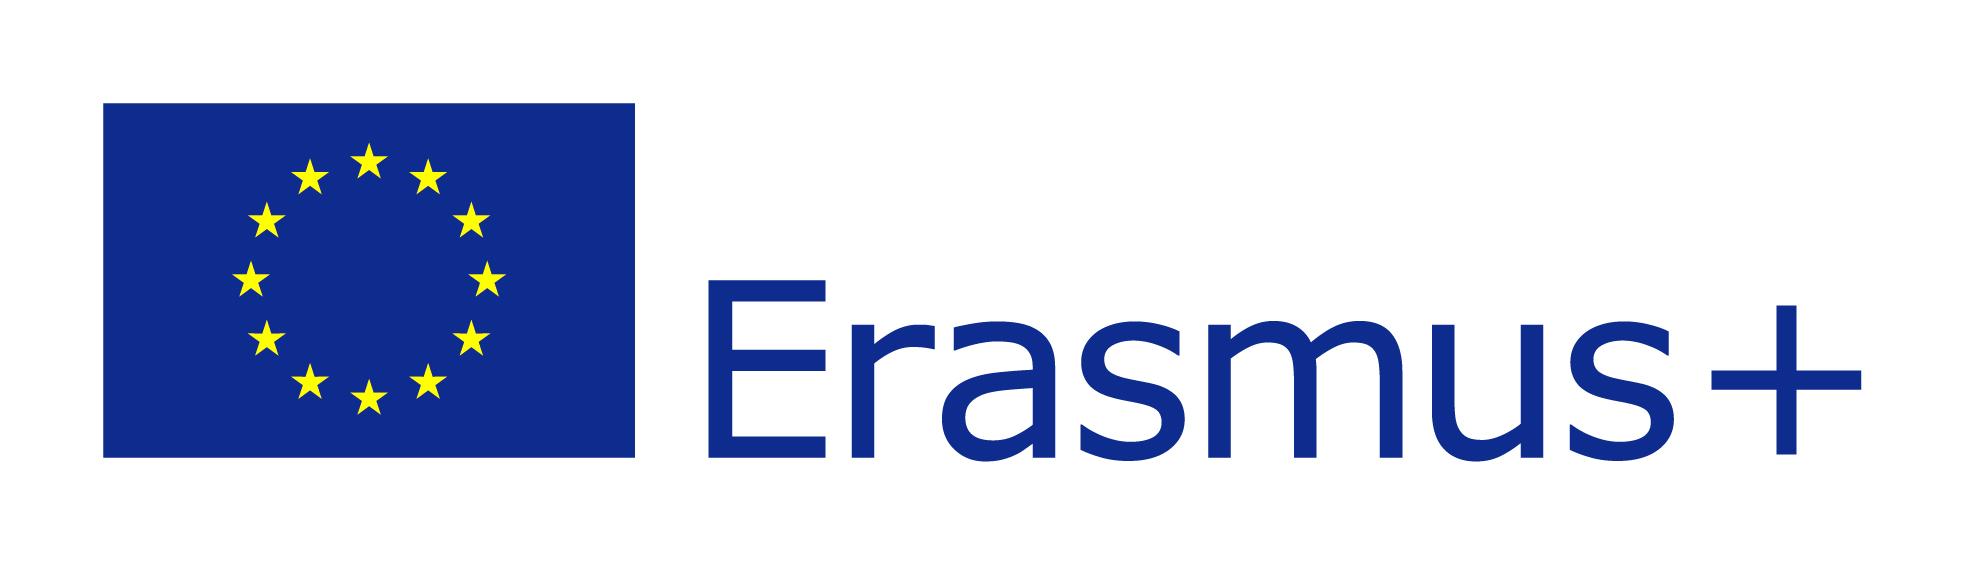 smokinya_Erasmus_logo_000.jpg